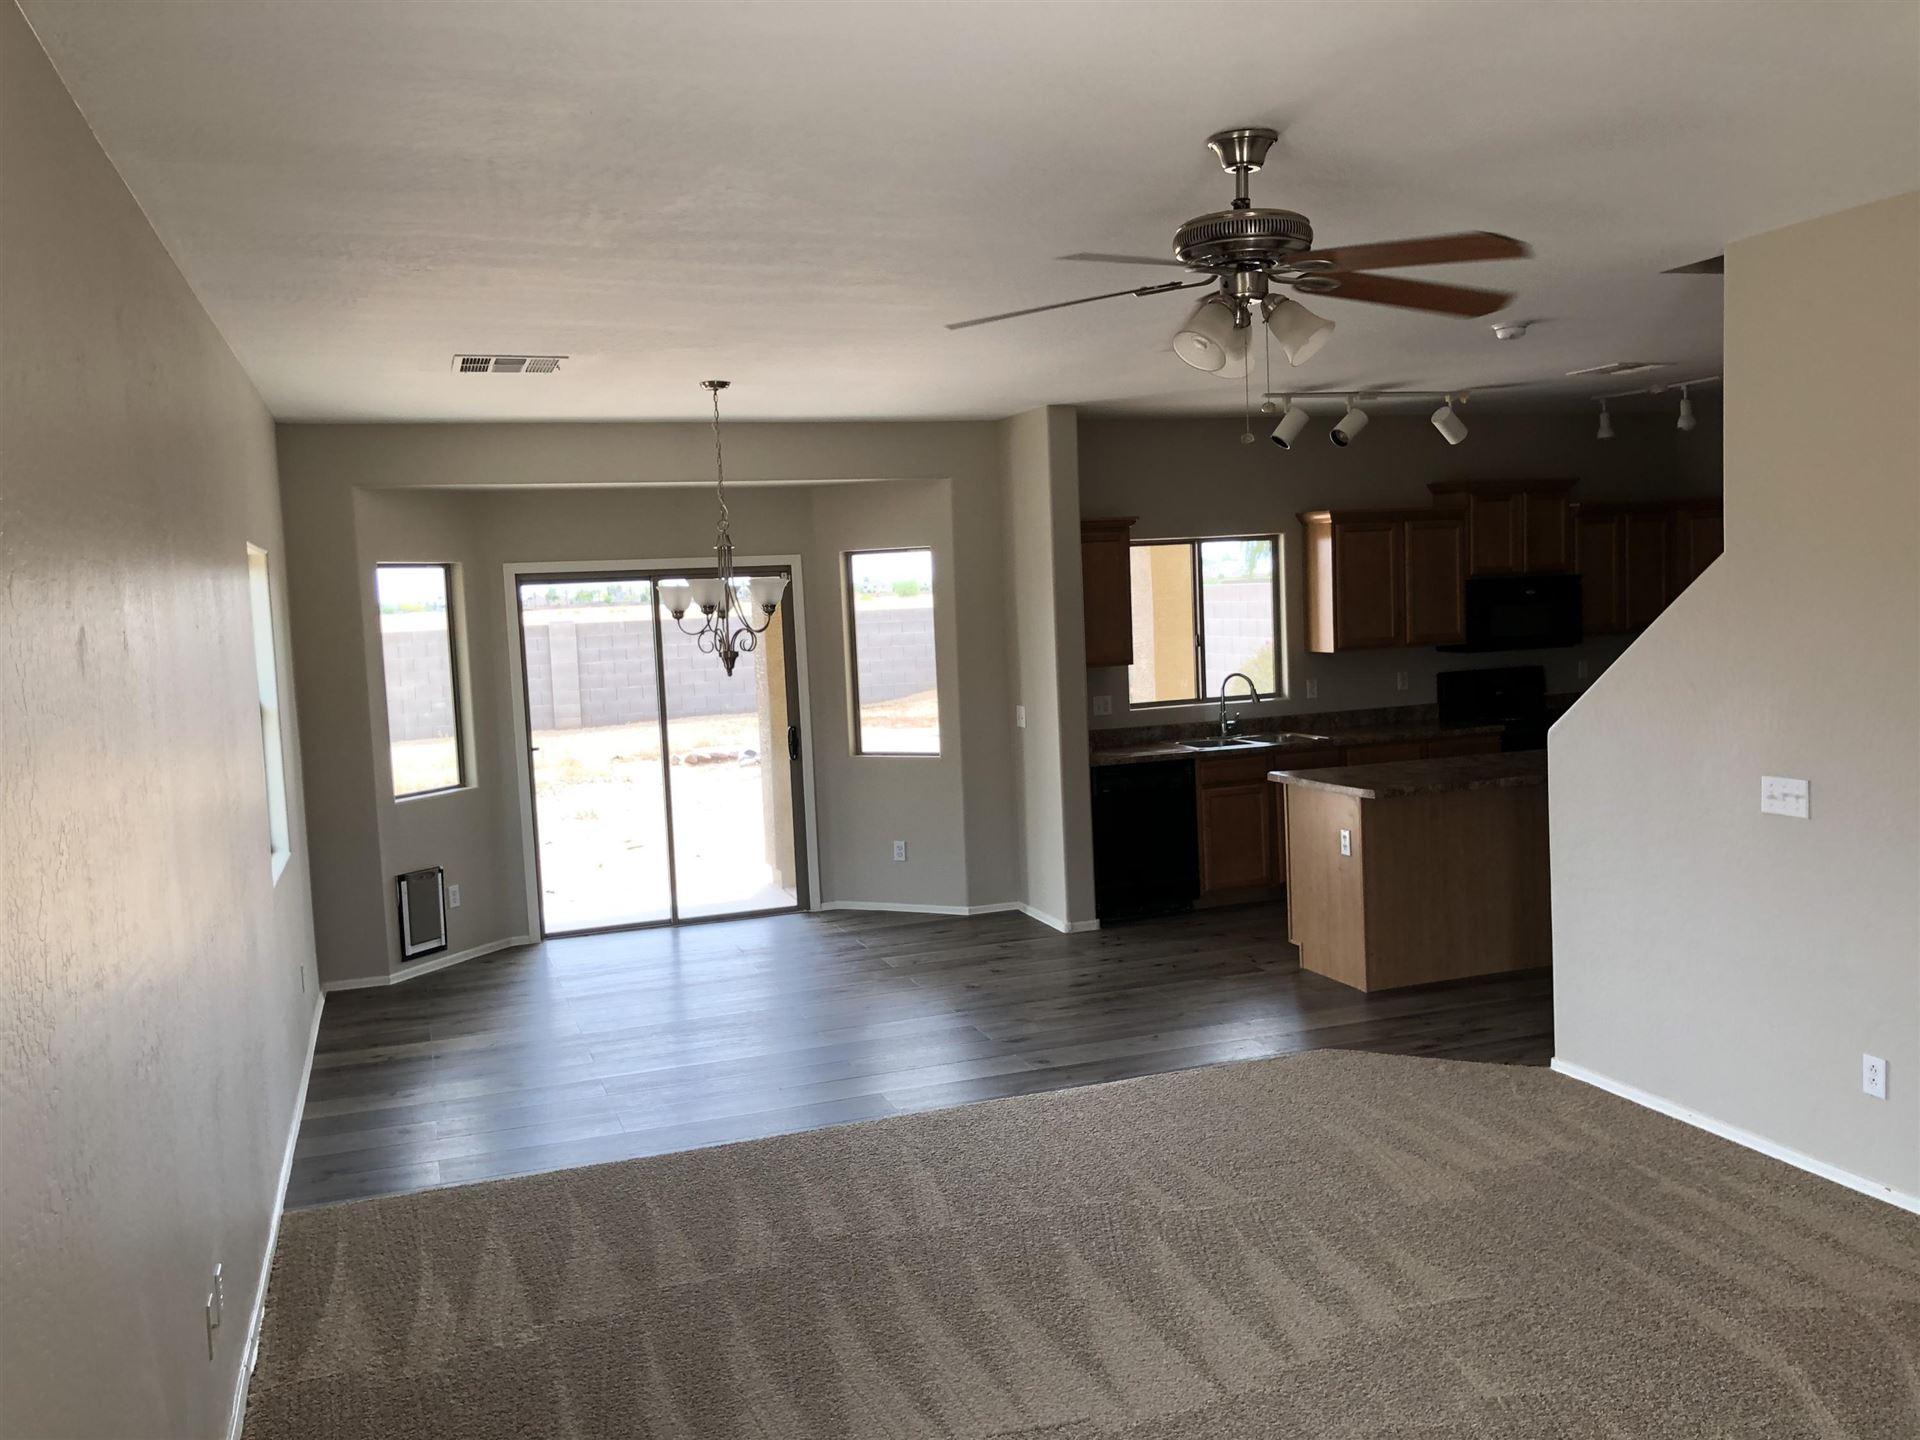 Photo of 35677 W VELAZQUEZ Drive, Maricopa, AZ 85138 (MLS # 6229960)